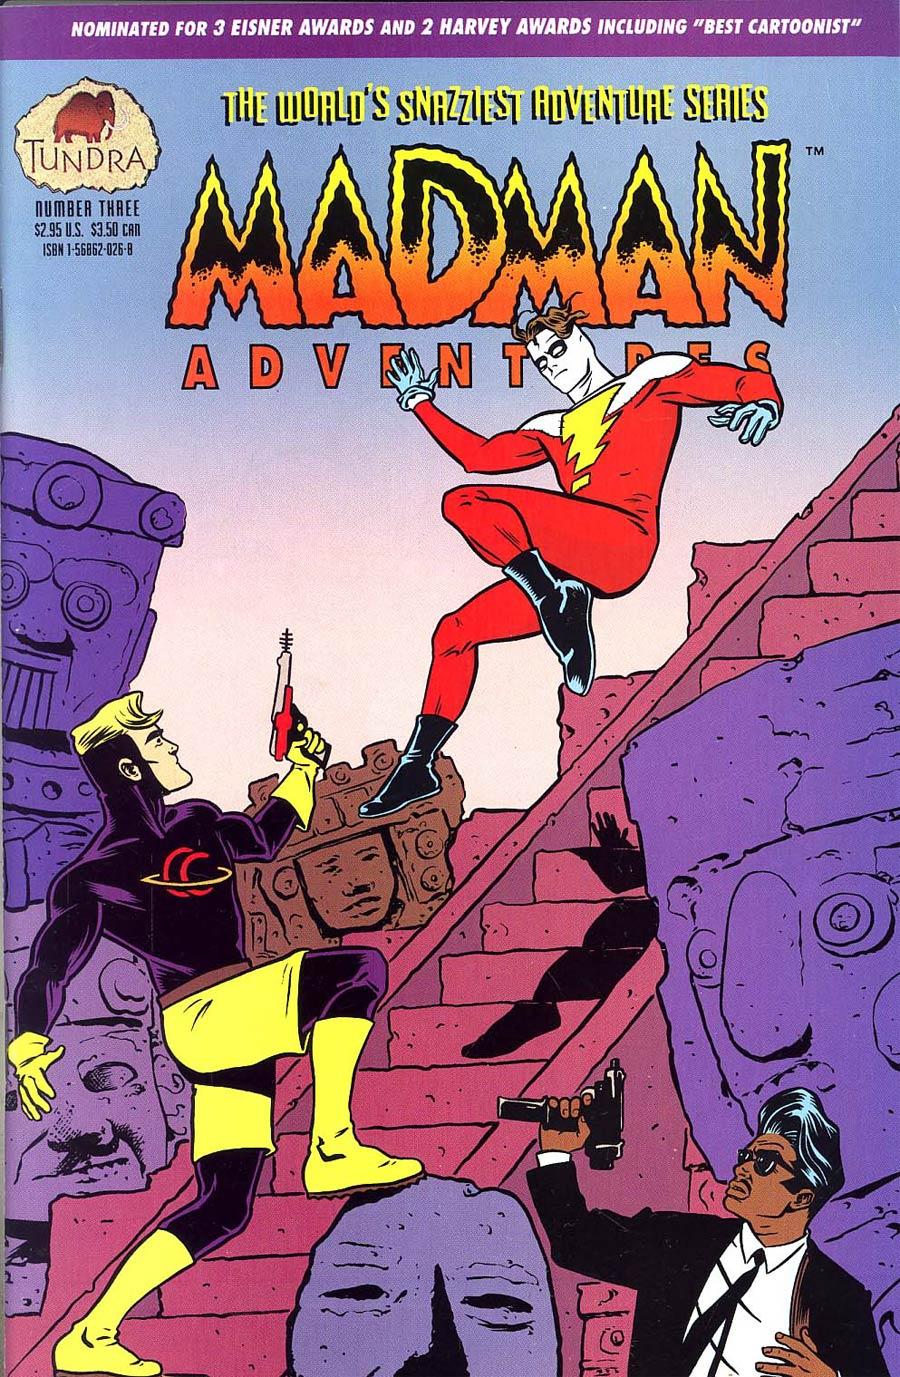 Madman Adventures #3